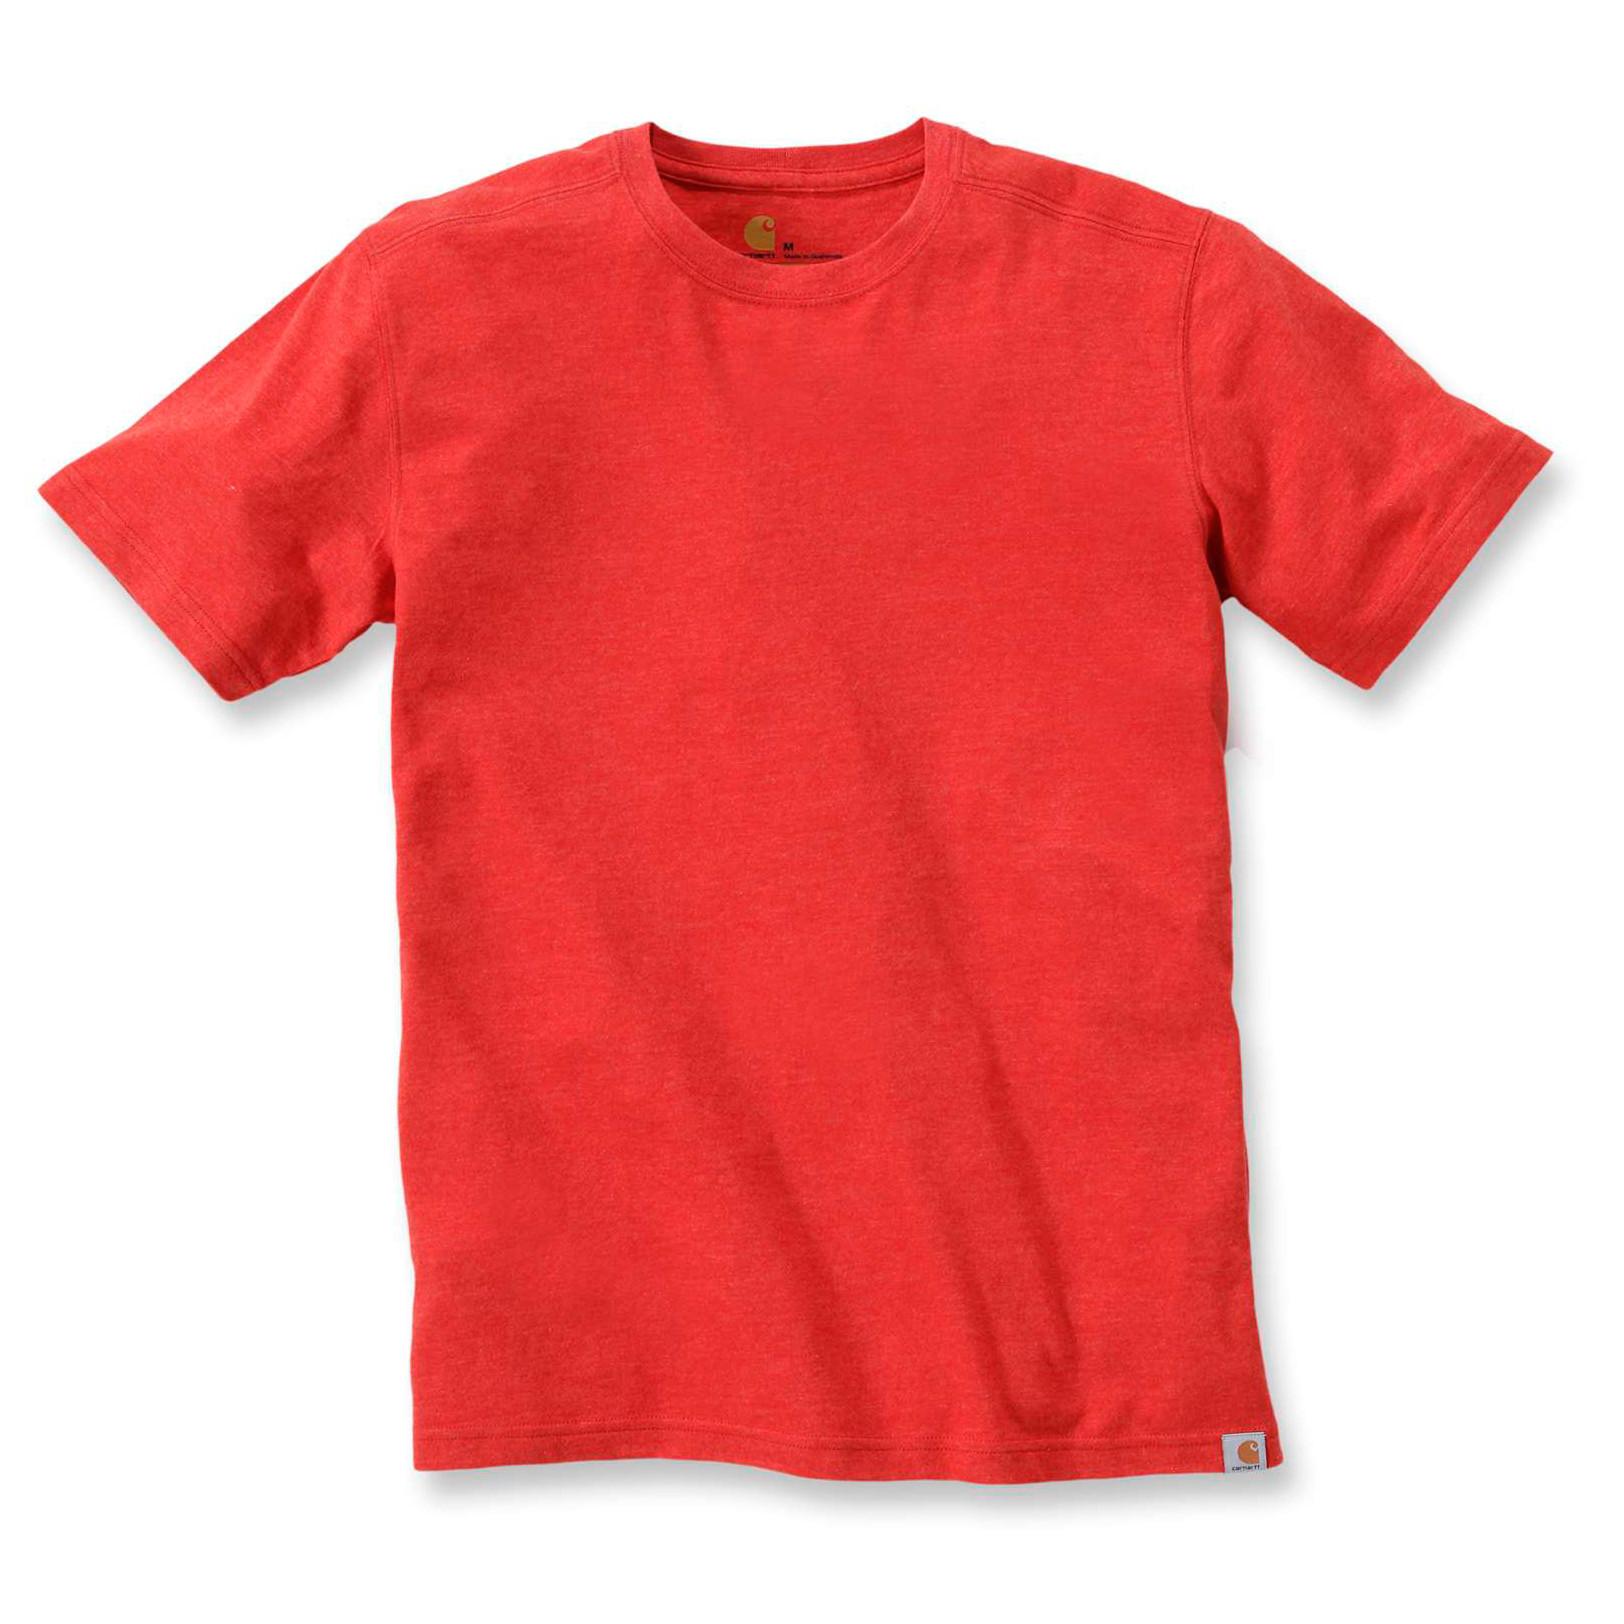 Футболка Carhartt Maddock T-Shirt S/S - 101124 (Chili Heather, M)